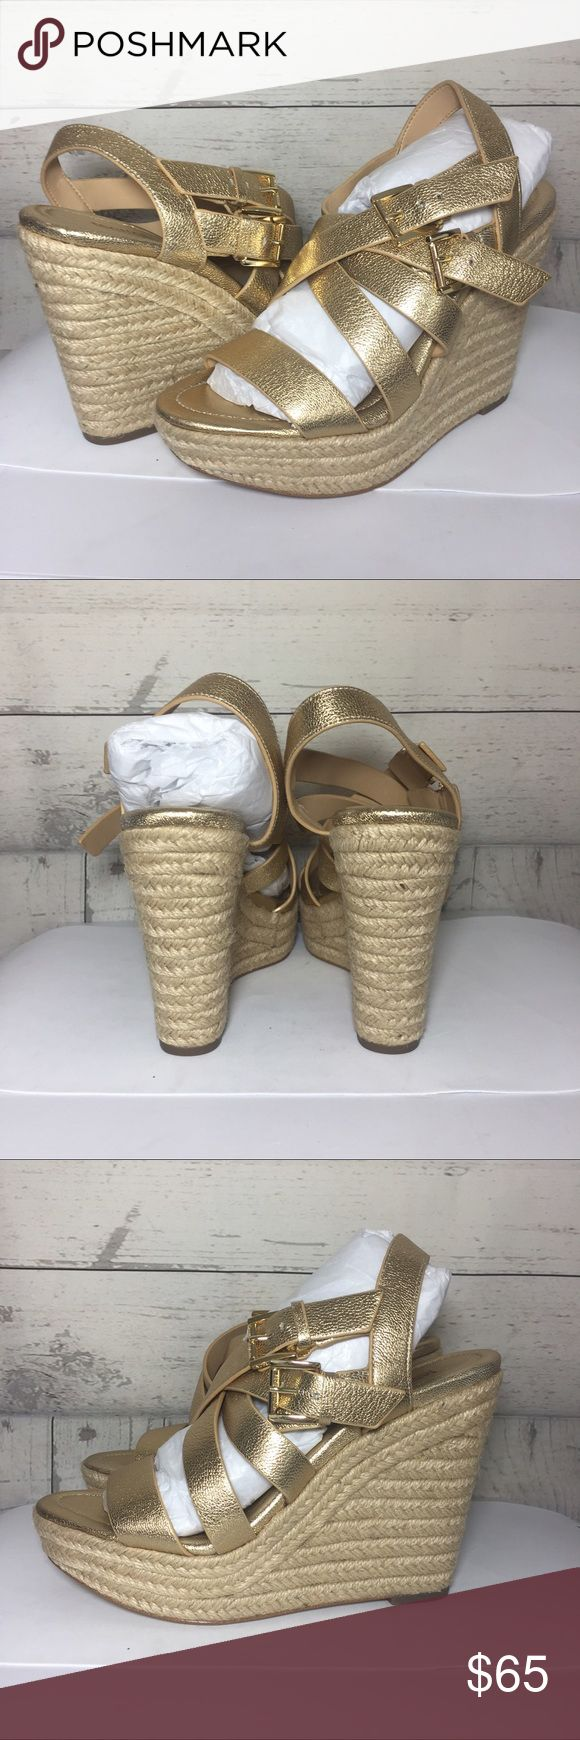 "Michael kors gold wedges 7m Michael Kors Wedge Gold Espadrille Metallic 7M Summer 4.5"" Heel Michael Kors Shoes Wedges"